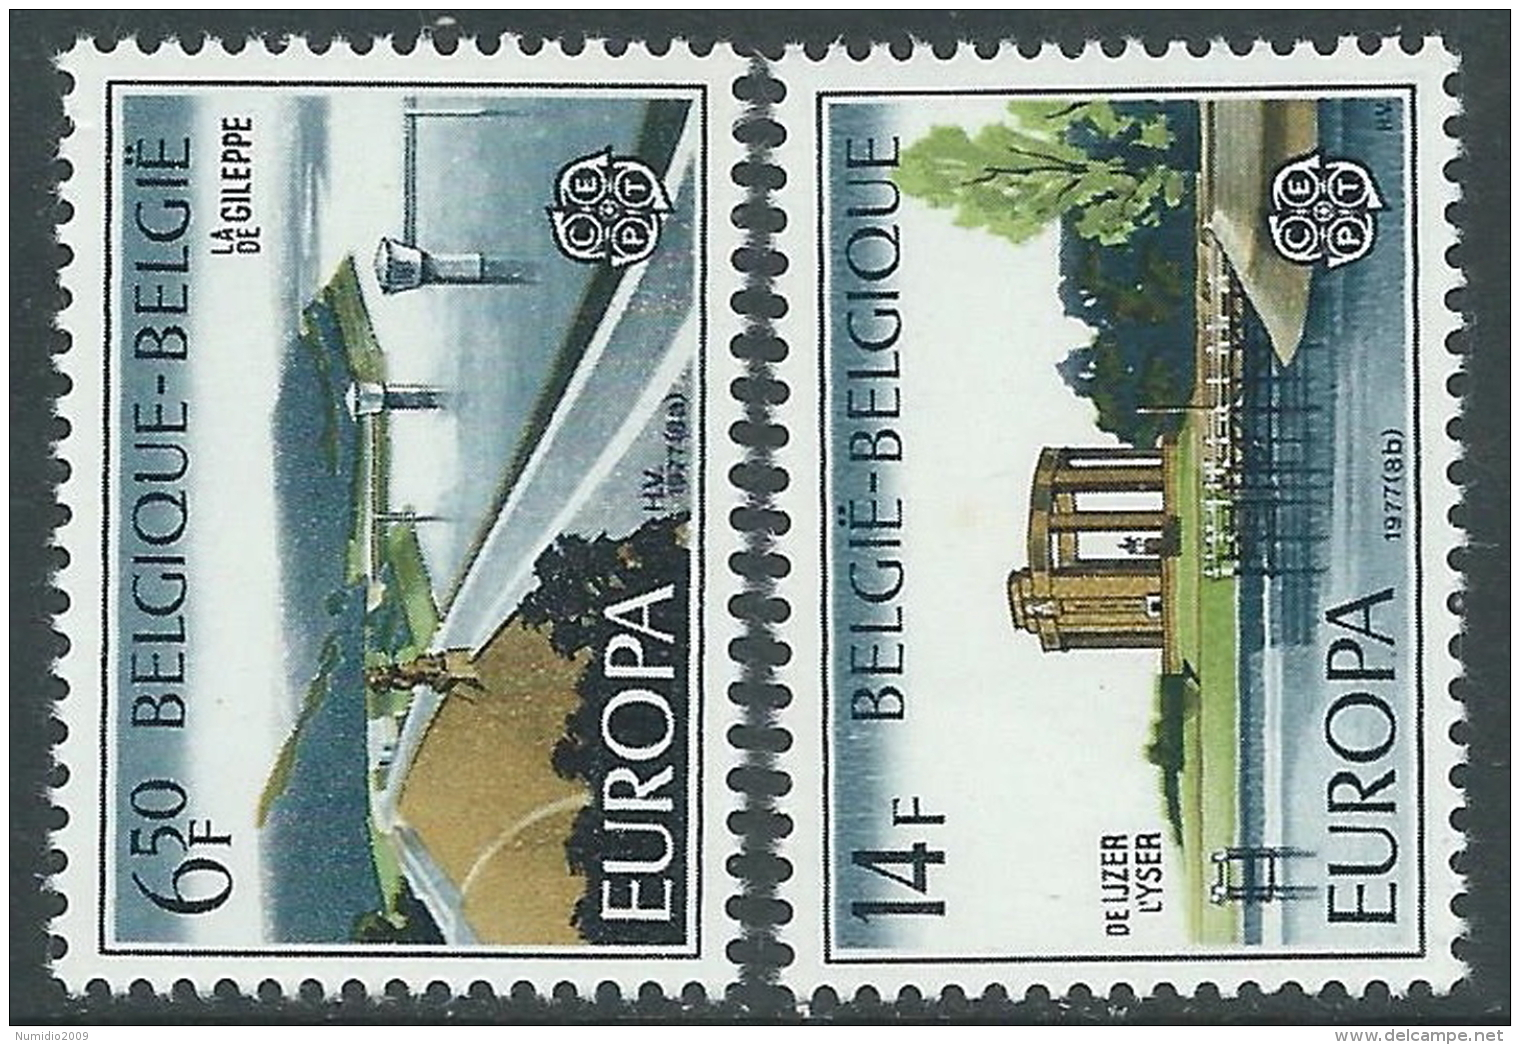 1977 EUROPA CEPT BELGIO MNH ** - R36-2 - 1977